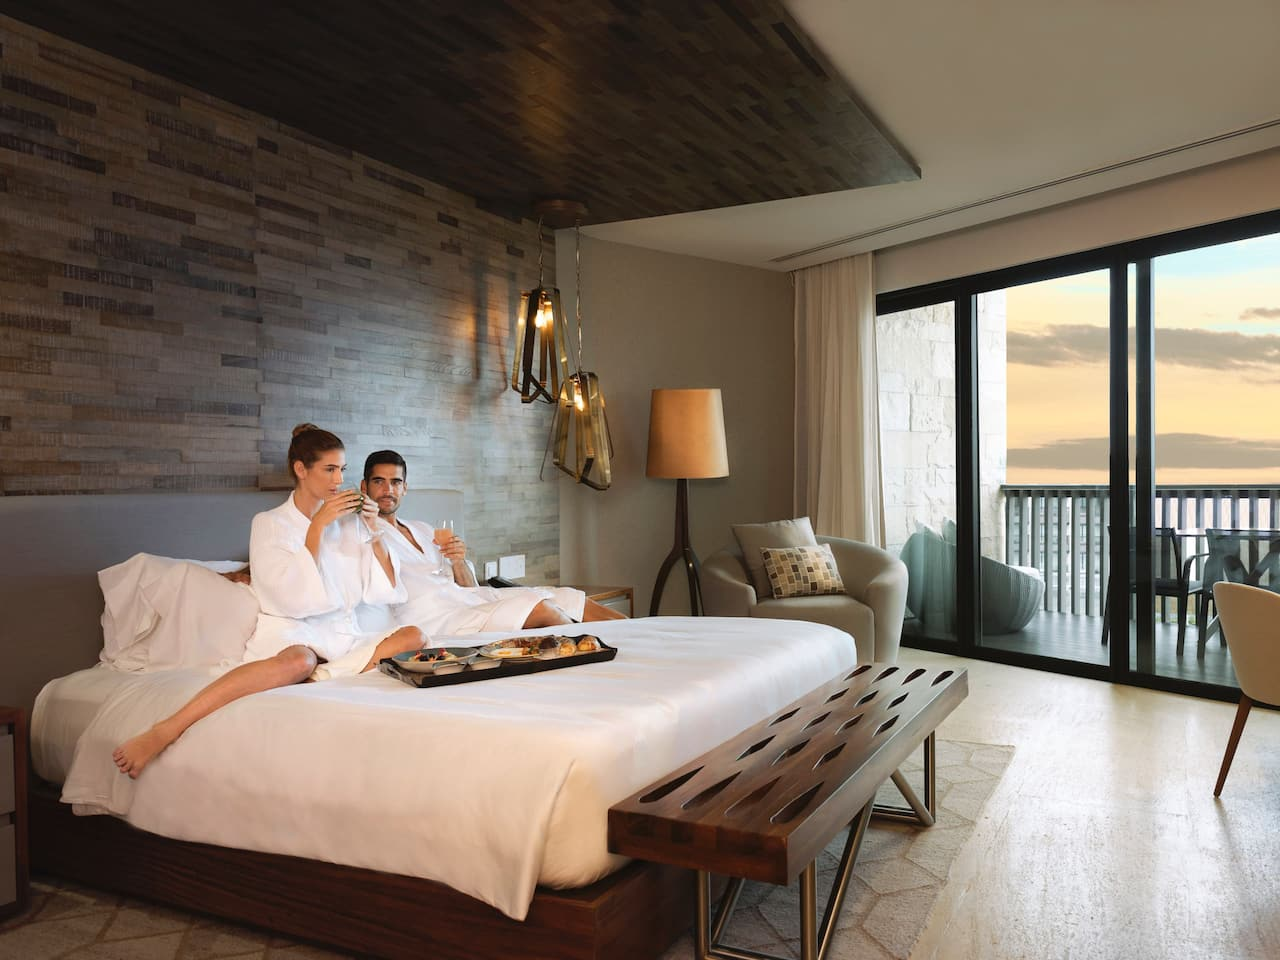 CUNPC_P430 Lifestyle Presidential Suite Oceanfront View